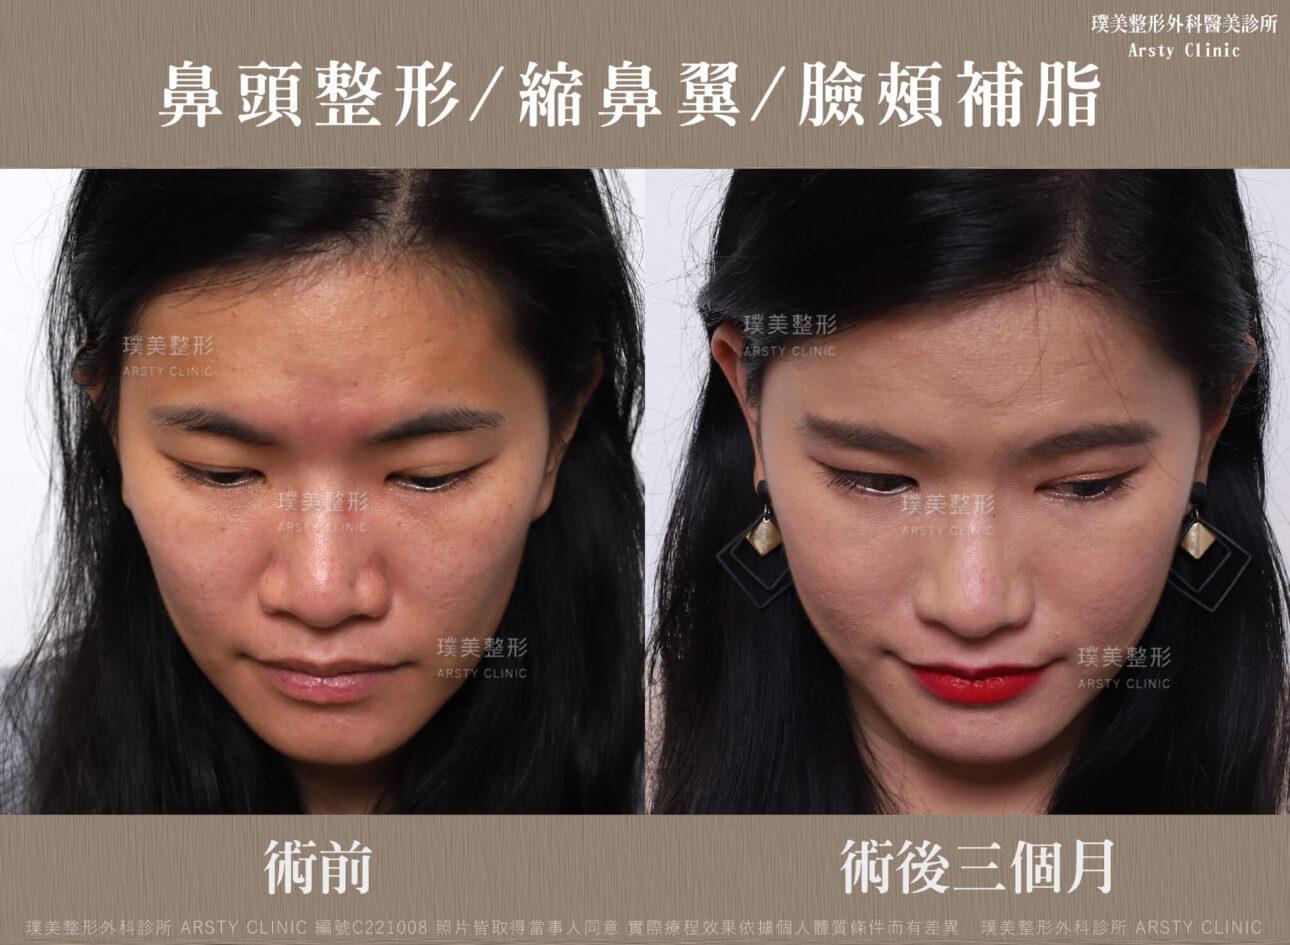 鼻頭整形 縮鼻翼 臉頰補脂 C221008BA3M03